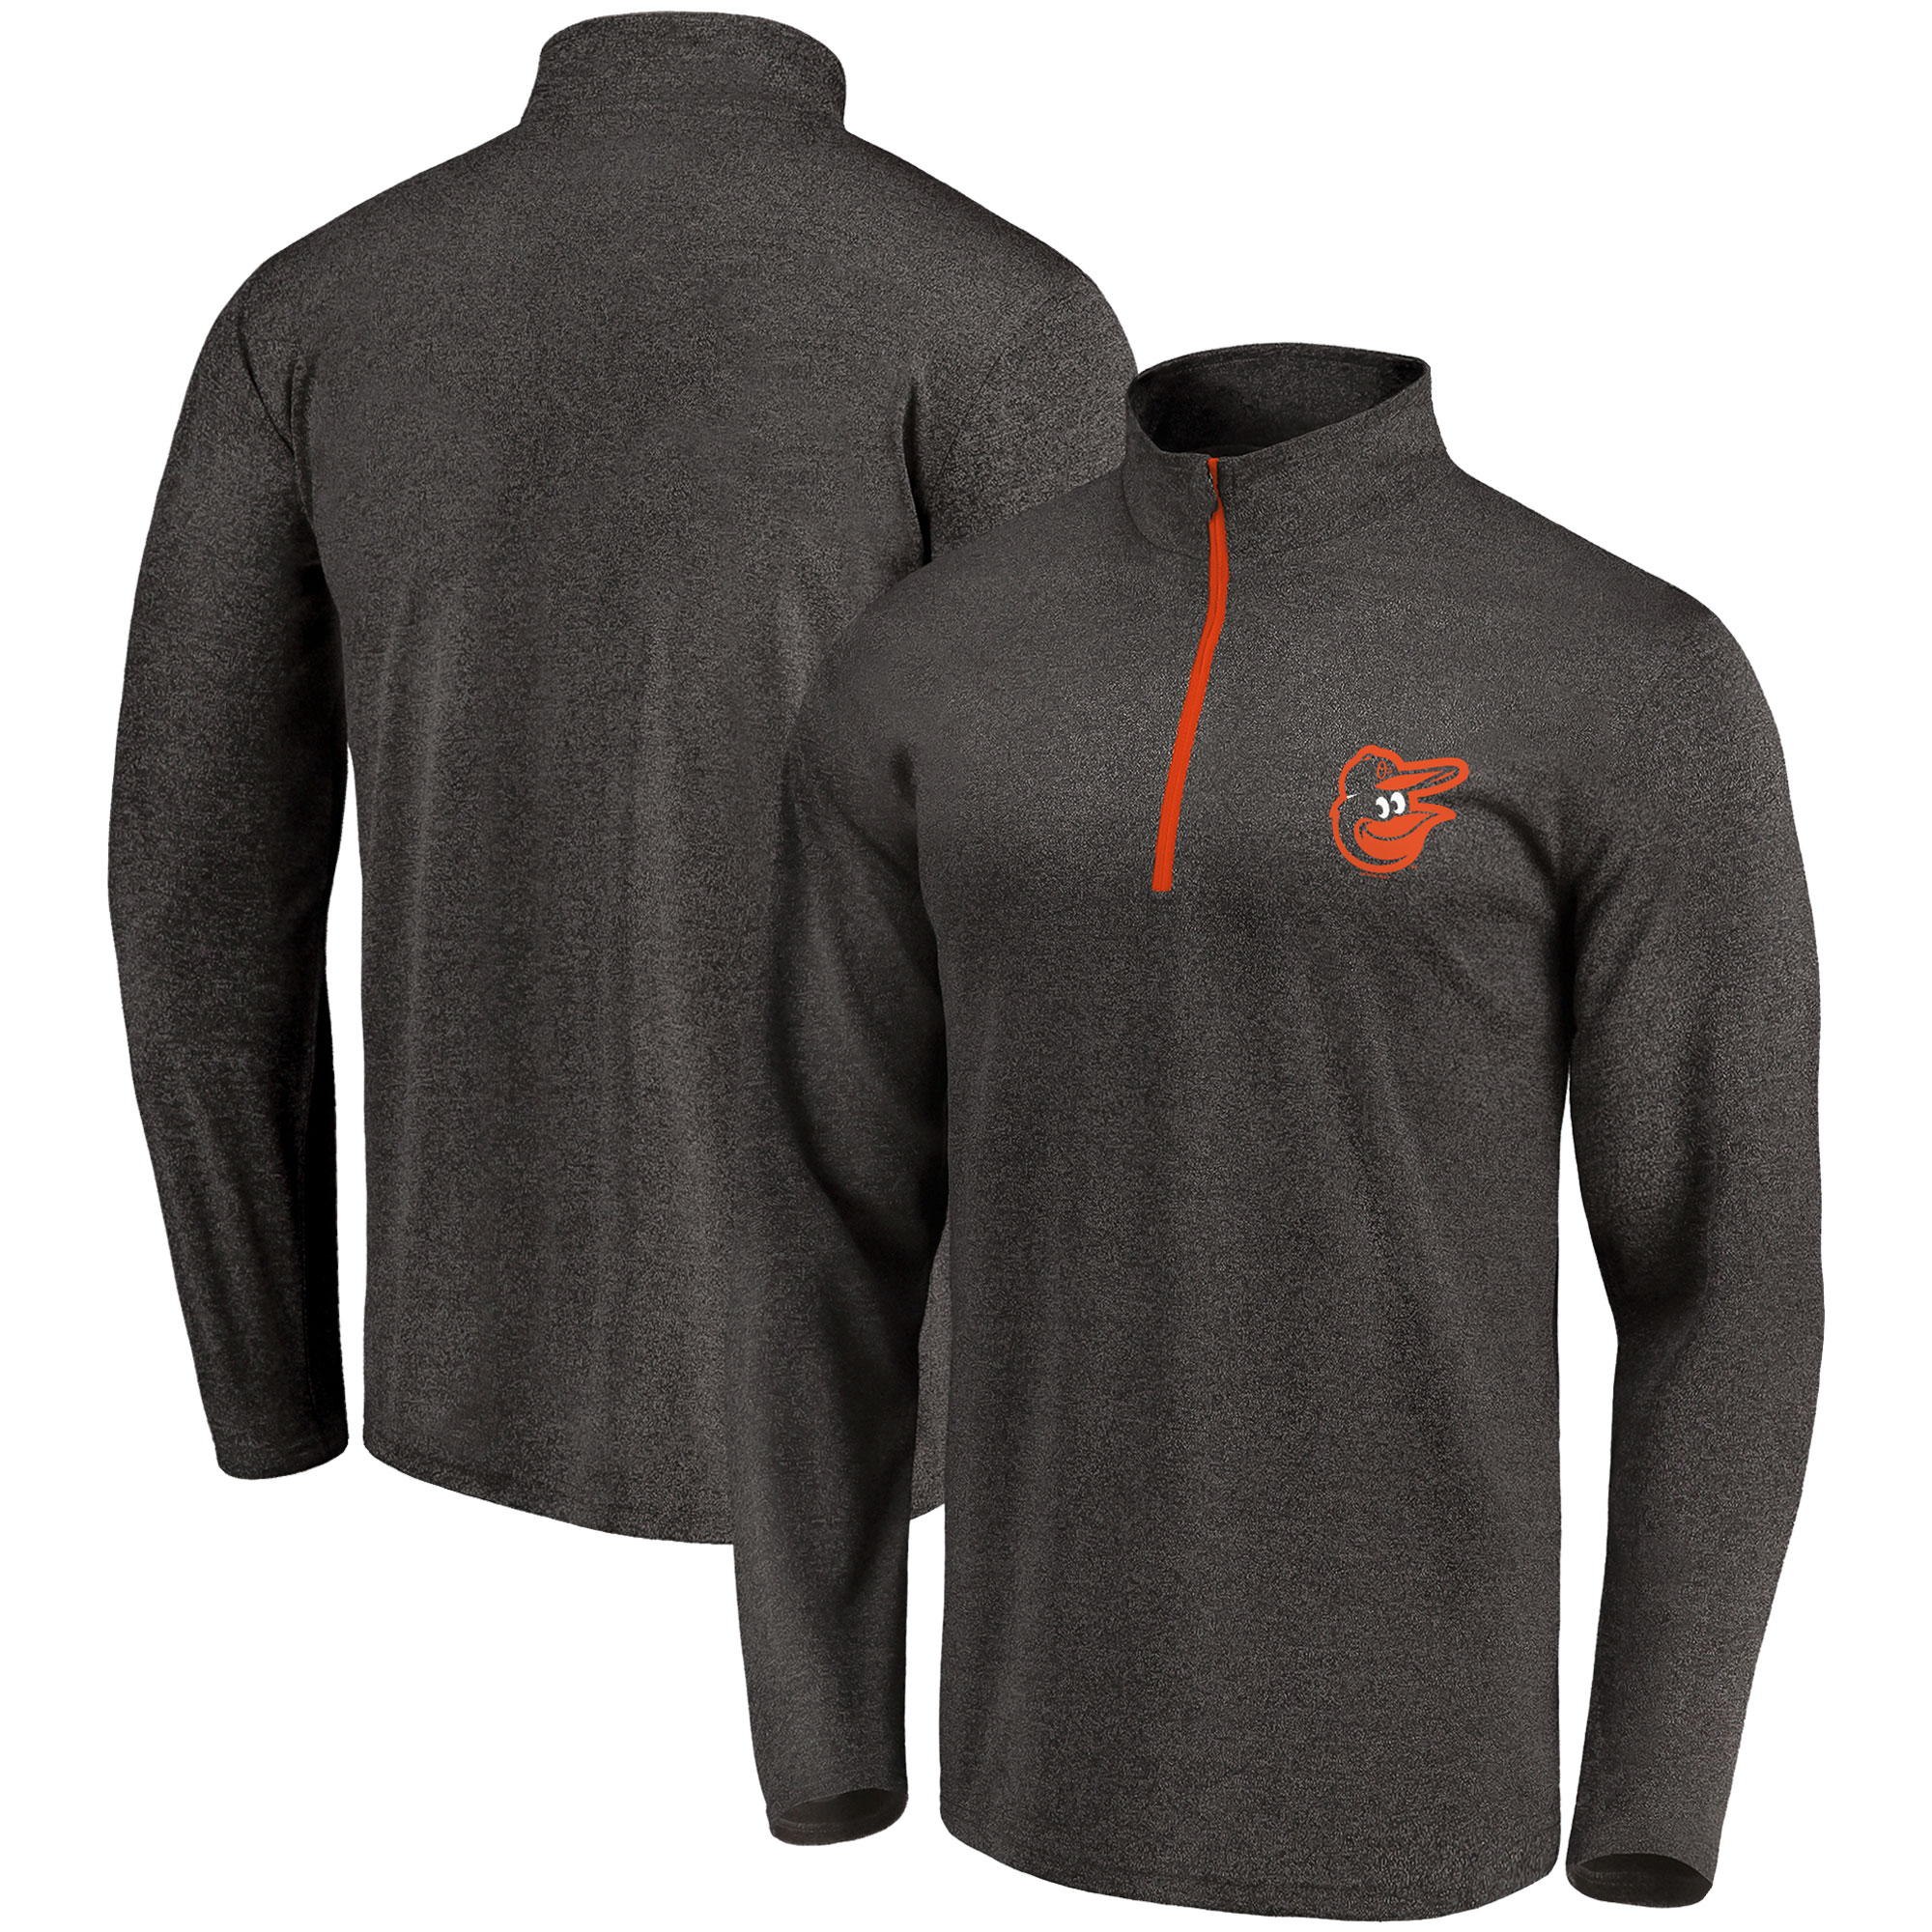 Baltimore Orioles Fanatics Branded Overtime Buzzer Quarter-Zip Pullover Jacket - Black